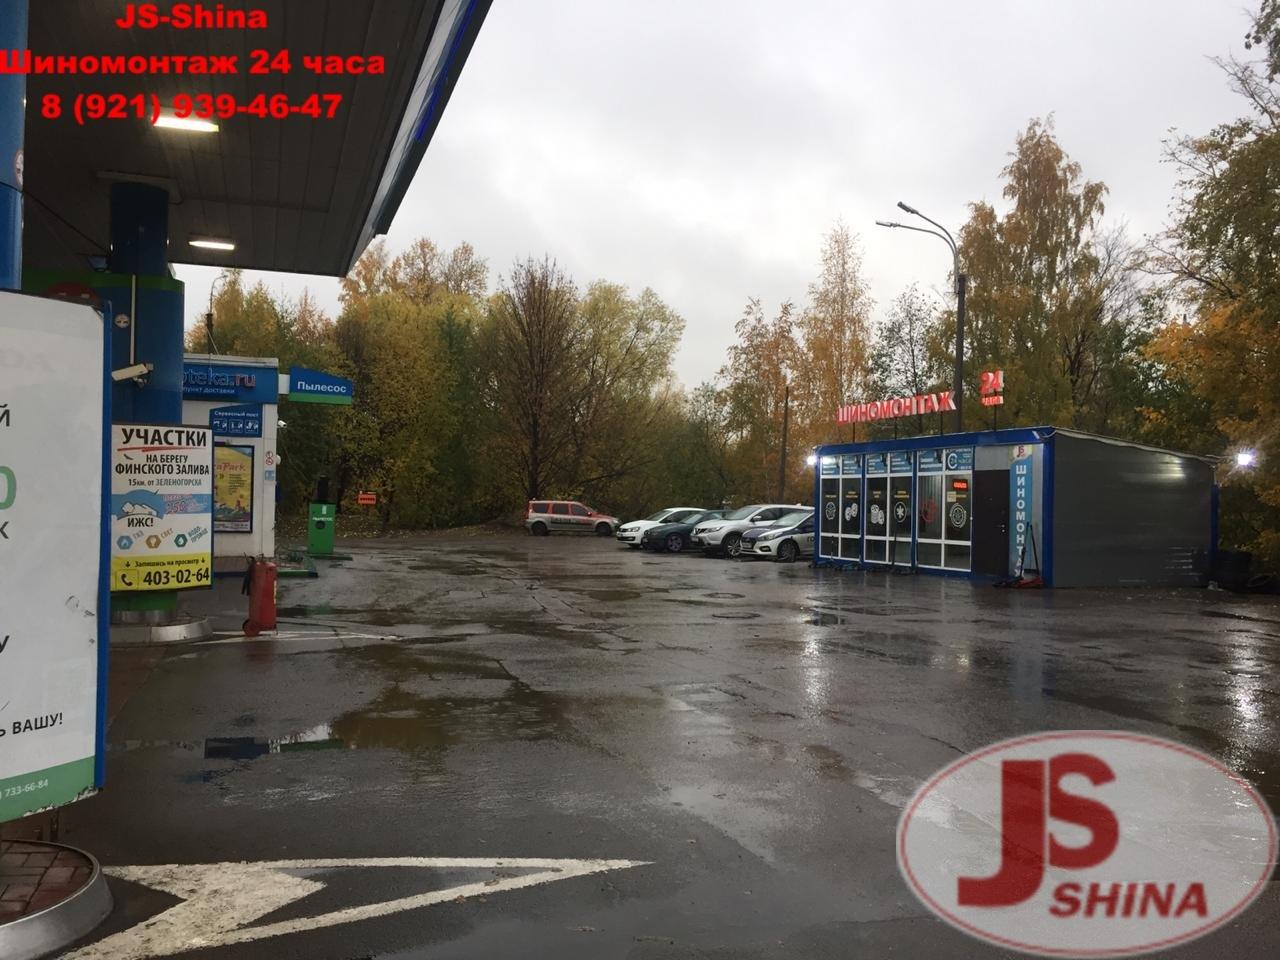 JS-Shina - Шиномонтаж 24 часа СПб, Объездное шоссе д. 15А